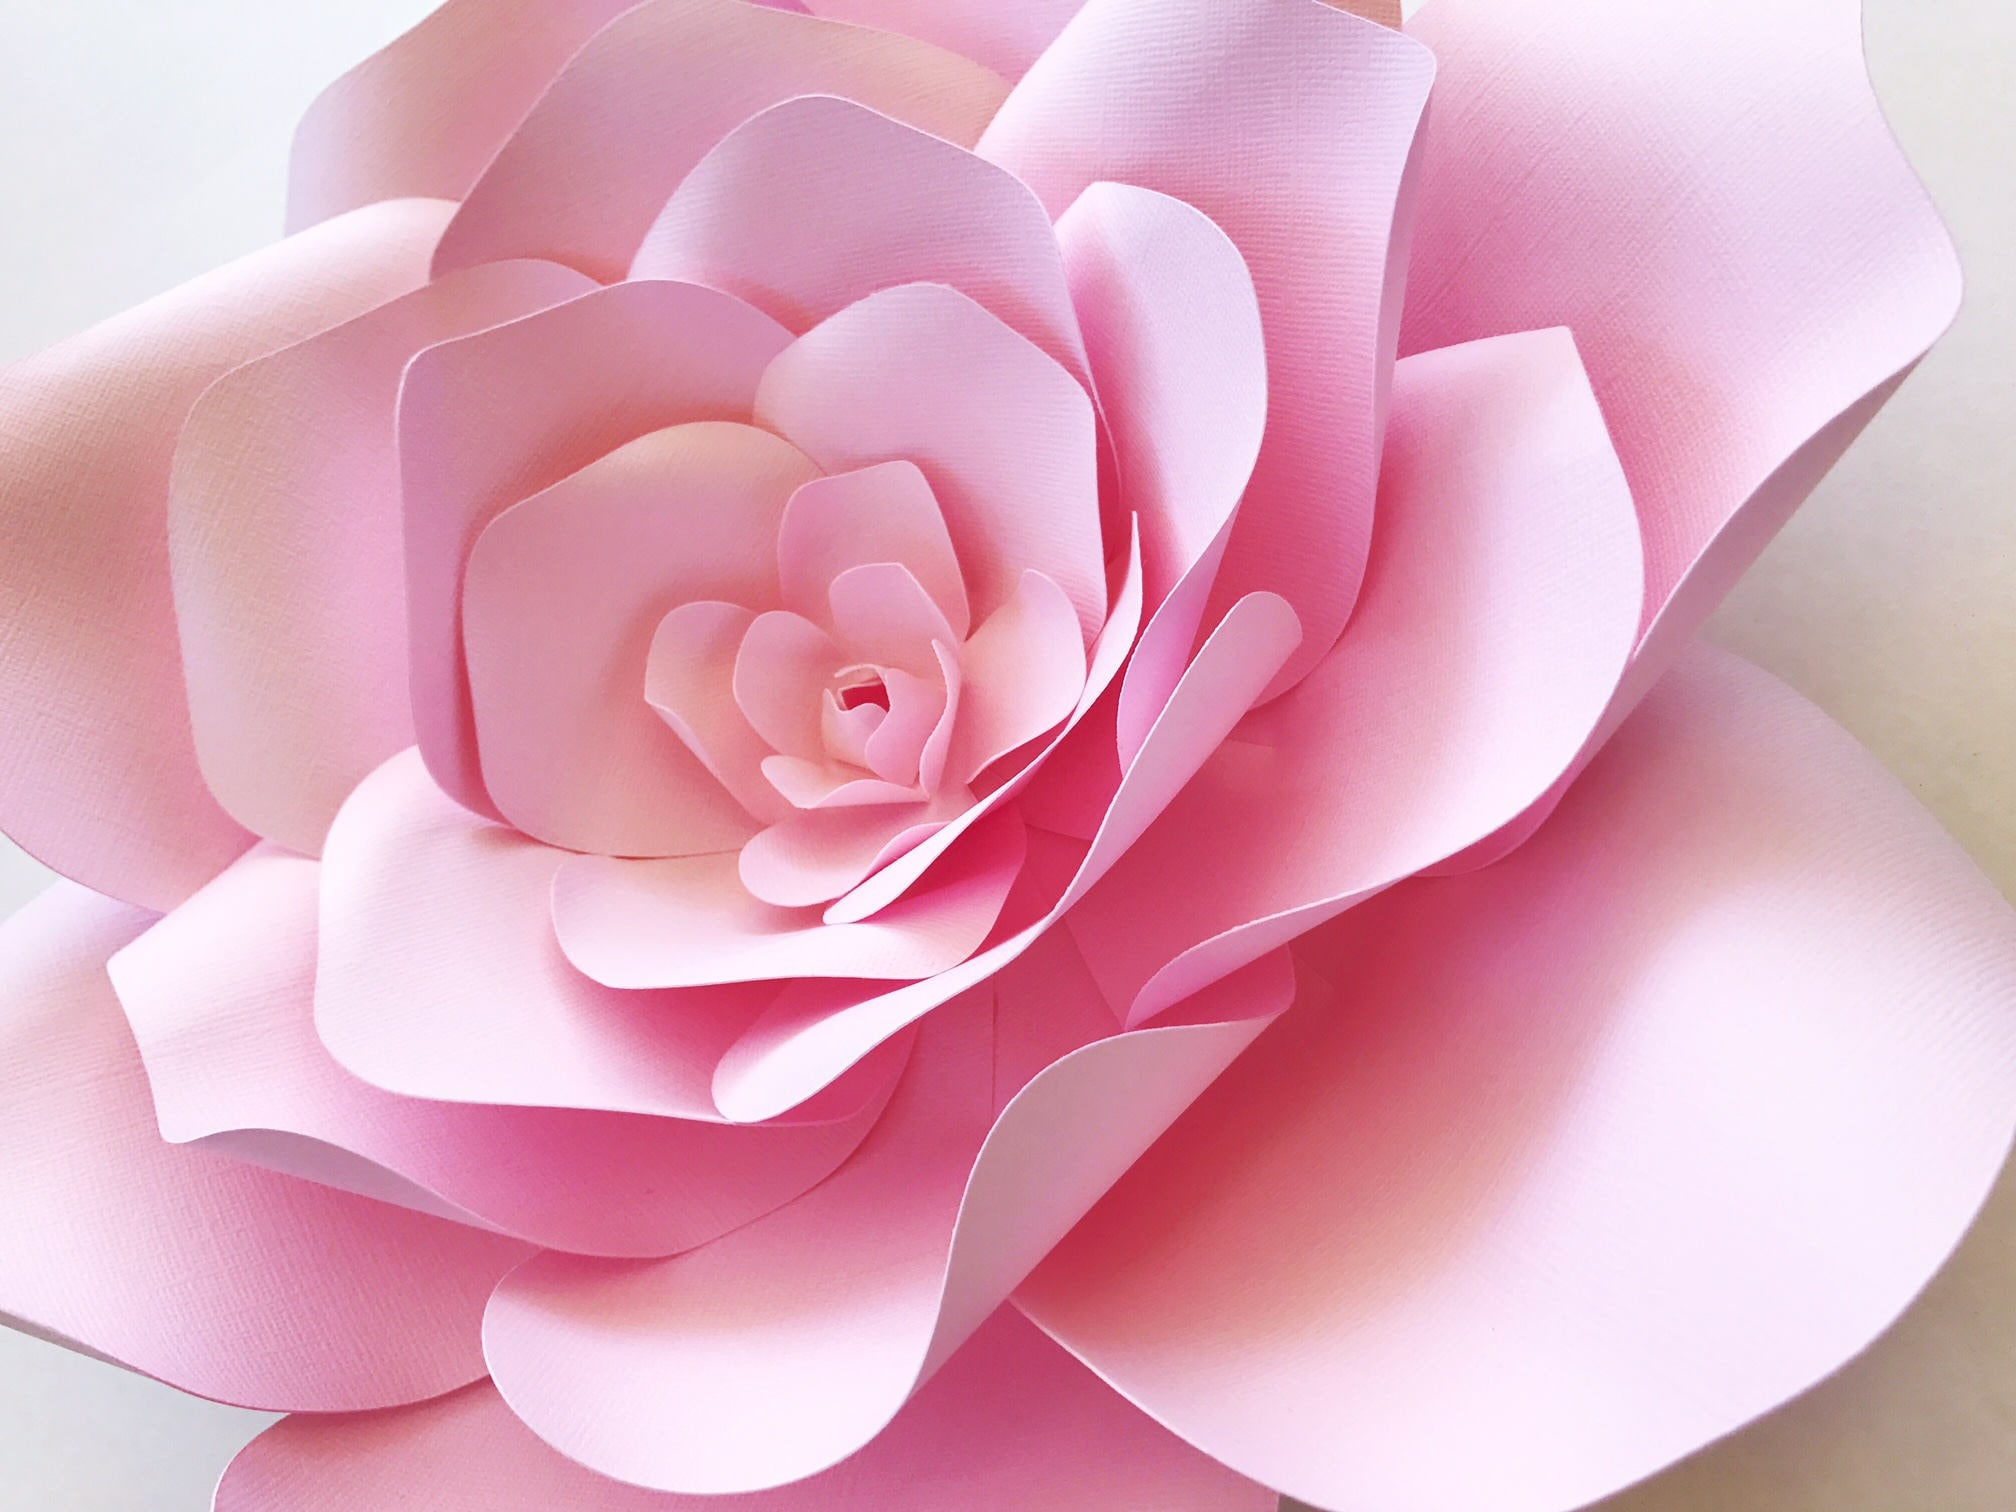 Diy Wall Flowers: Paper Flower Template, Paper Flower Wall, DIY Paper Flower